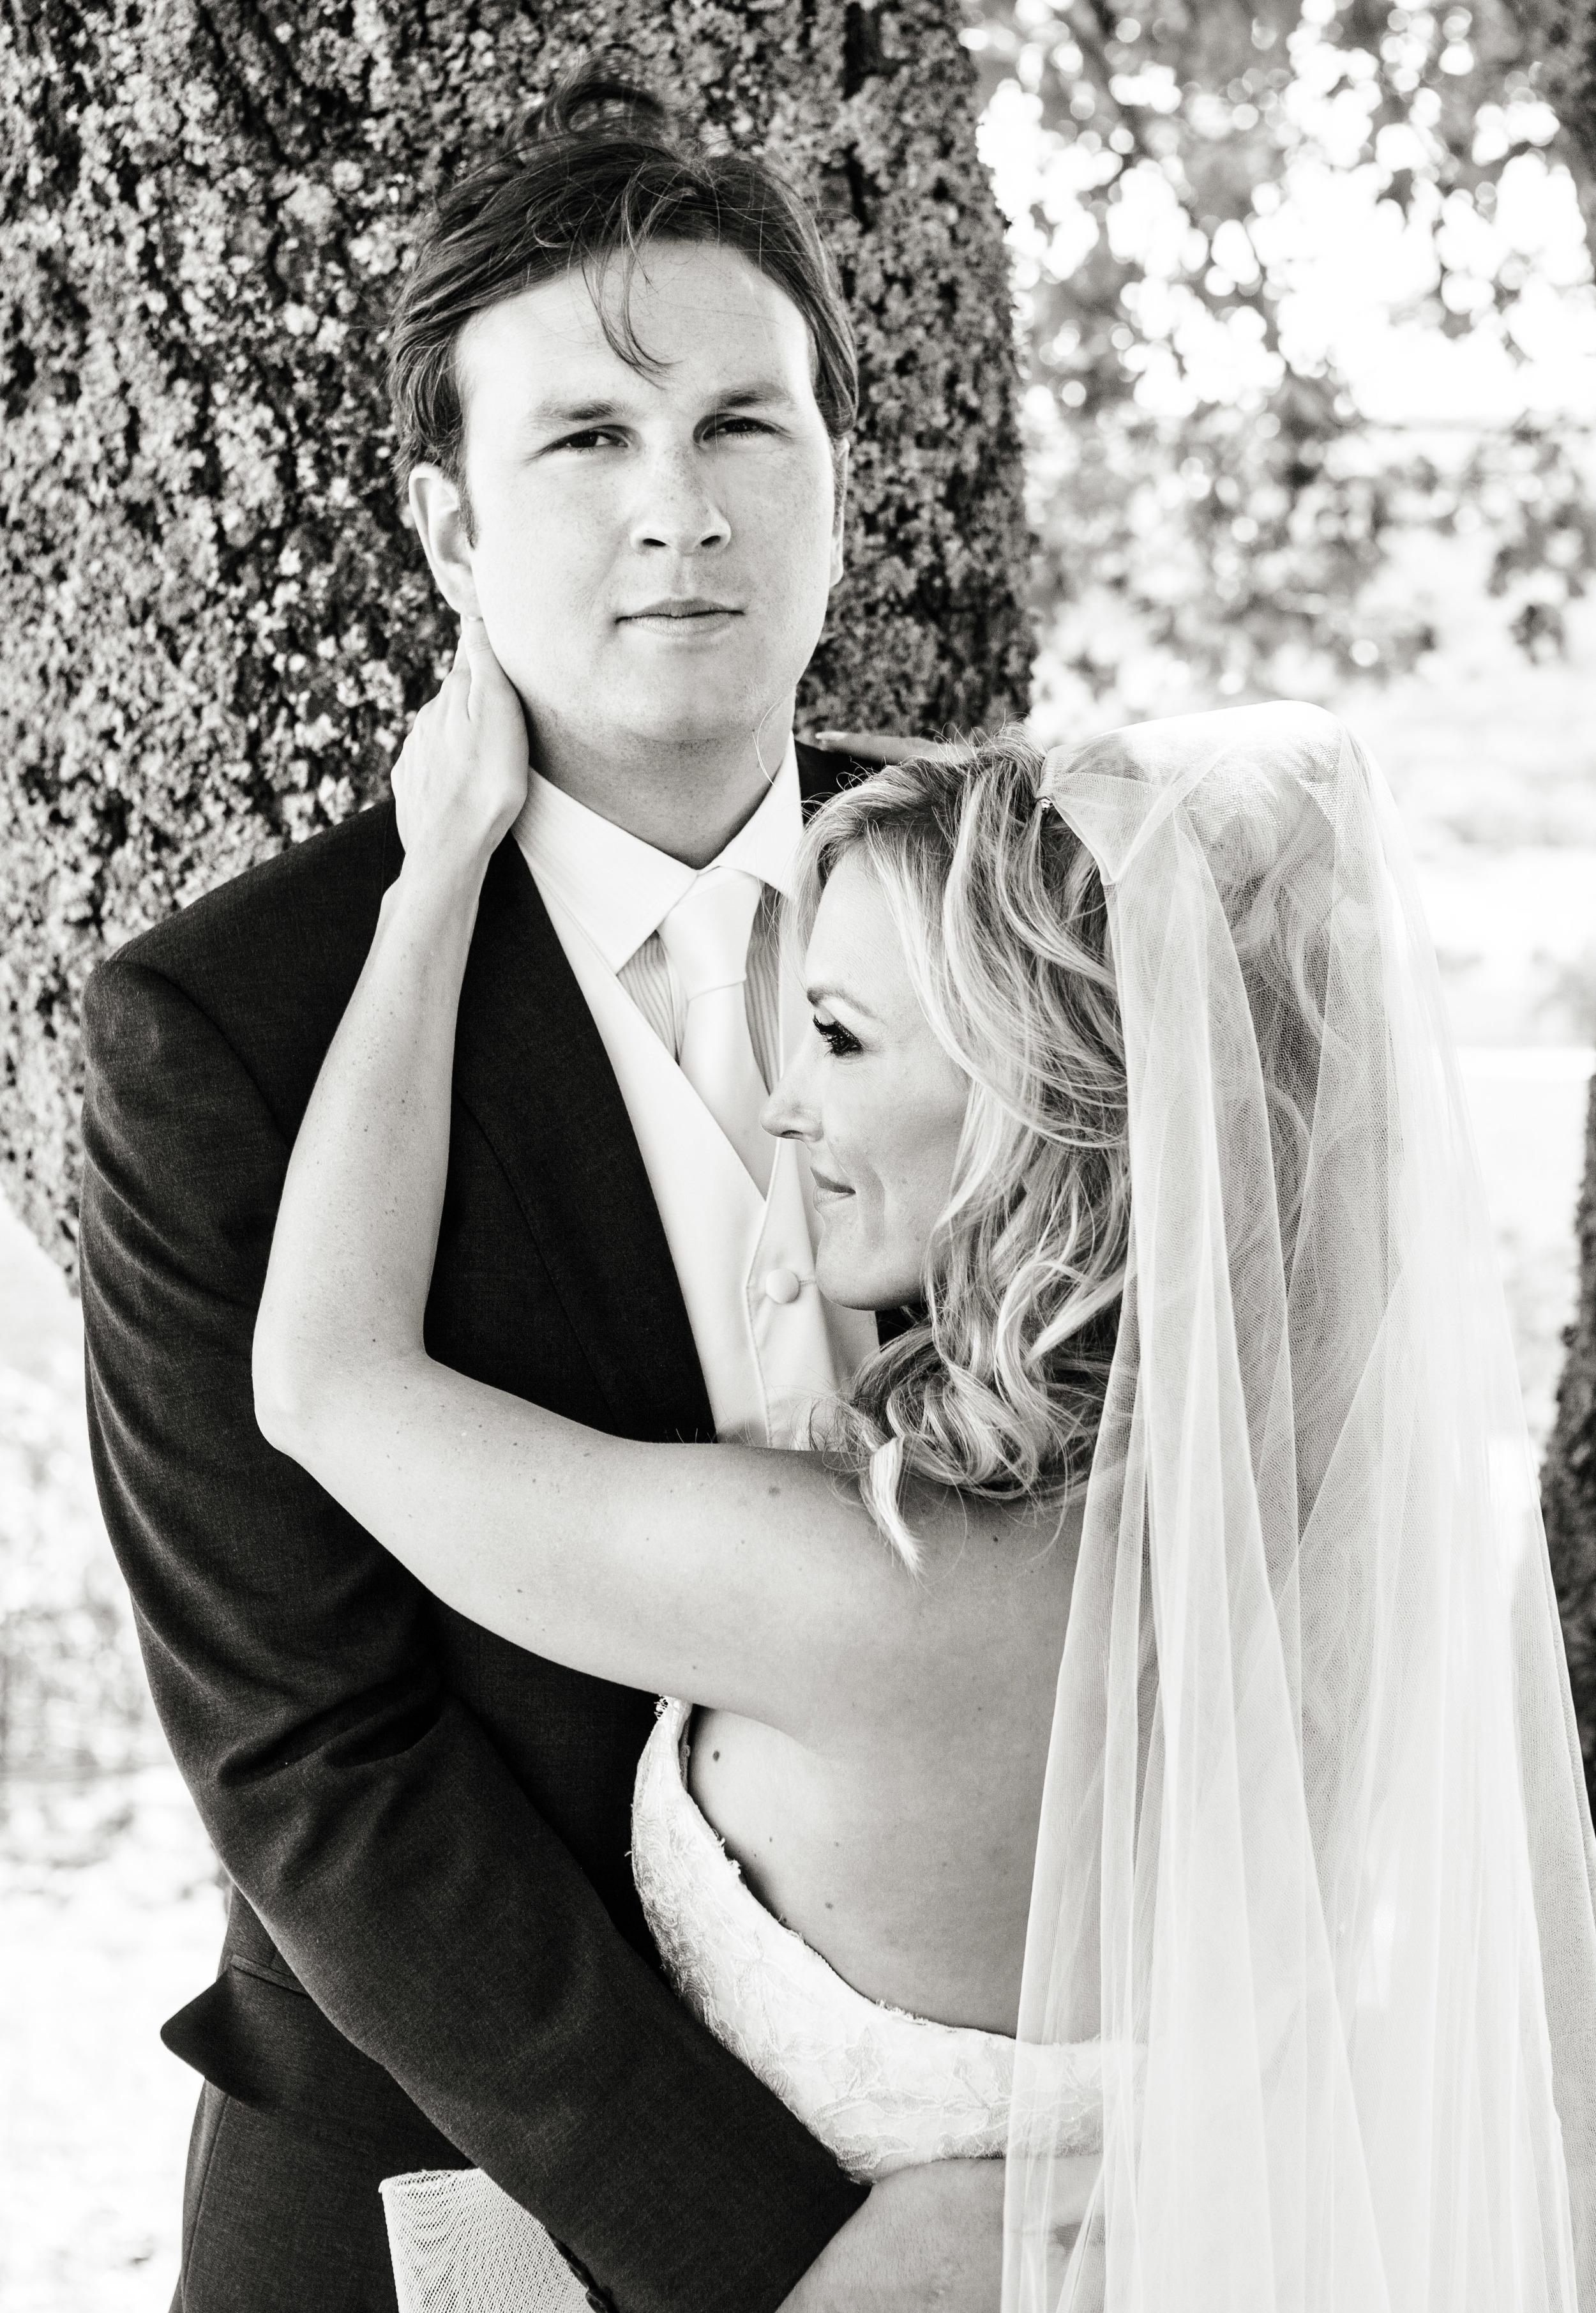 12. LS - napa wedding, vineyard ceremony, artsy bride & groom shot.jpg